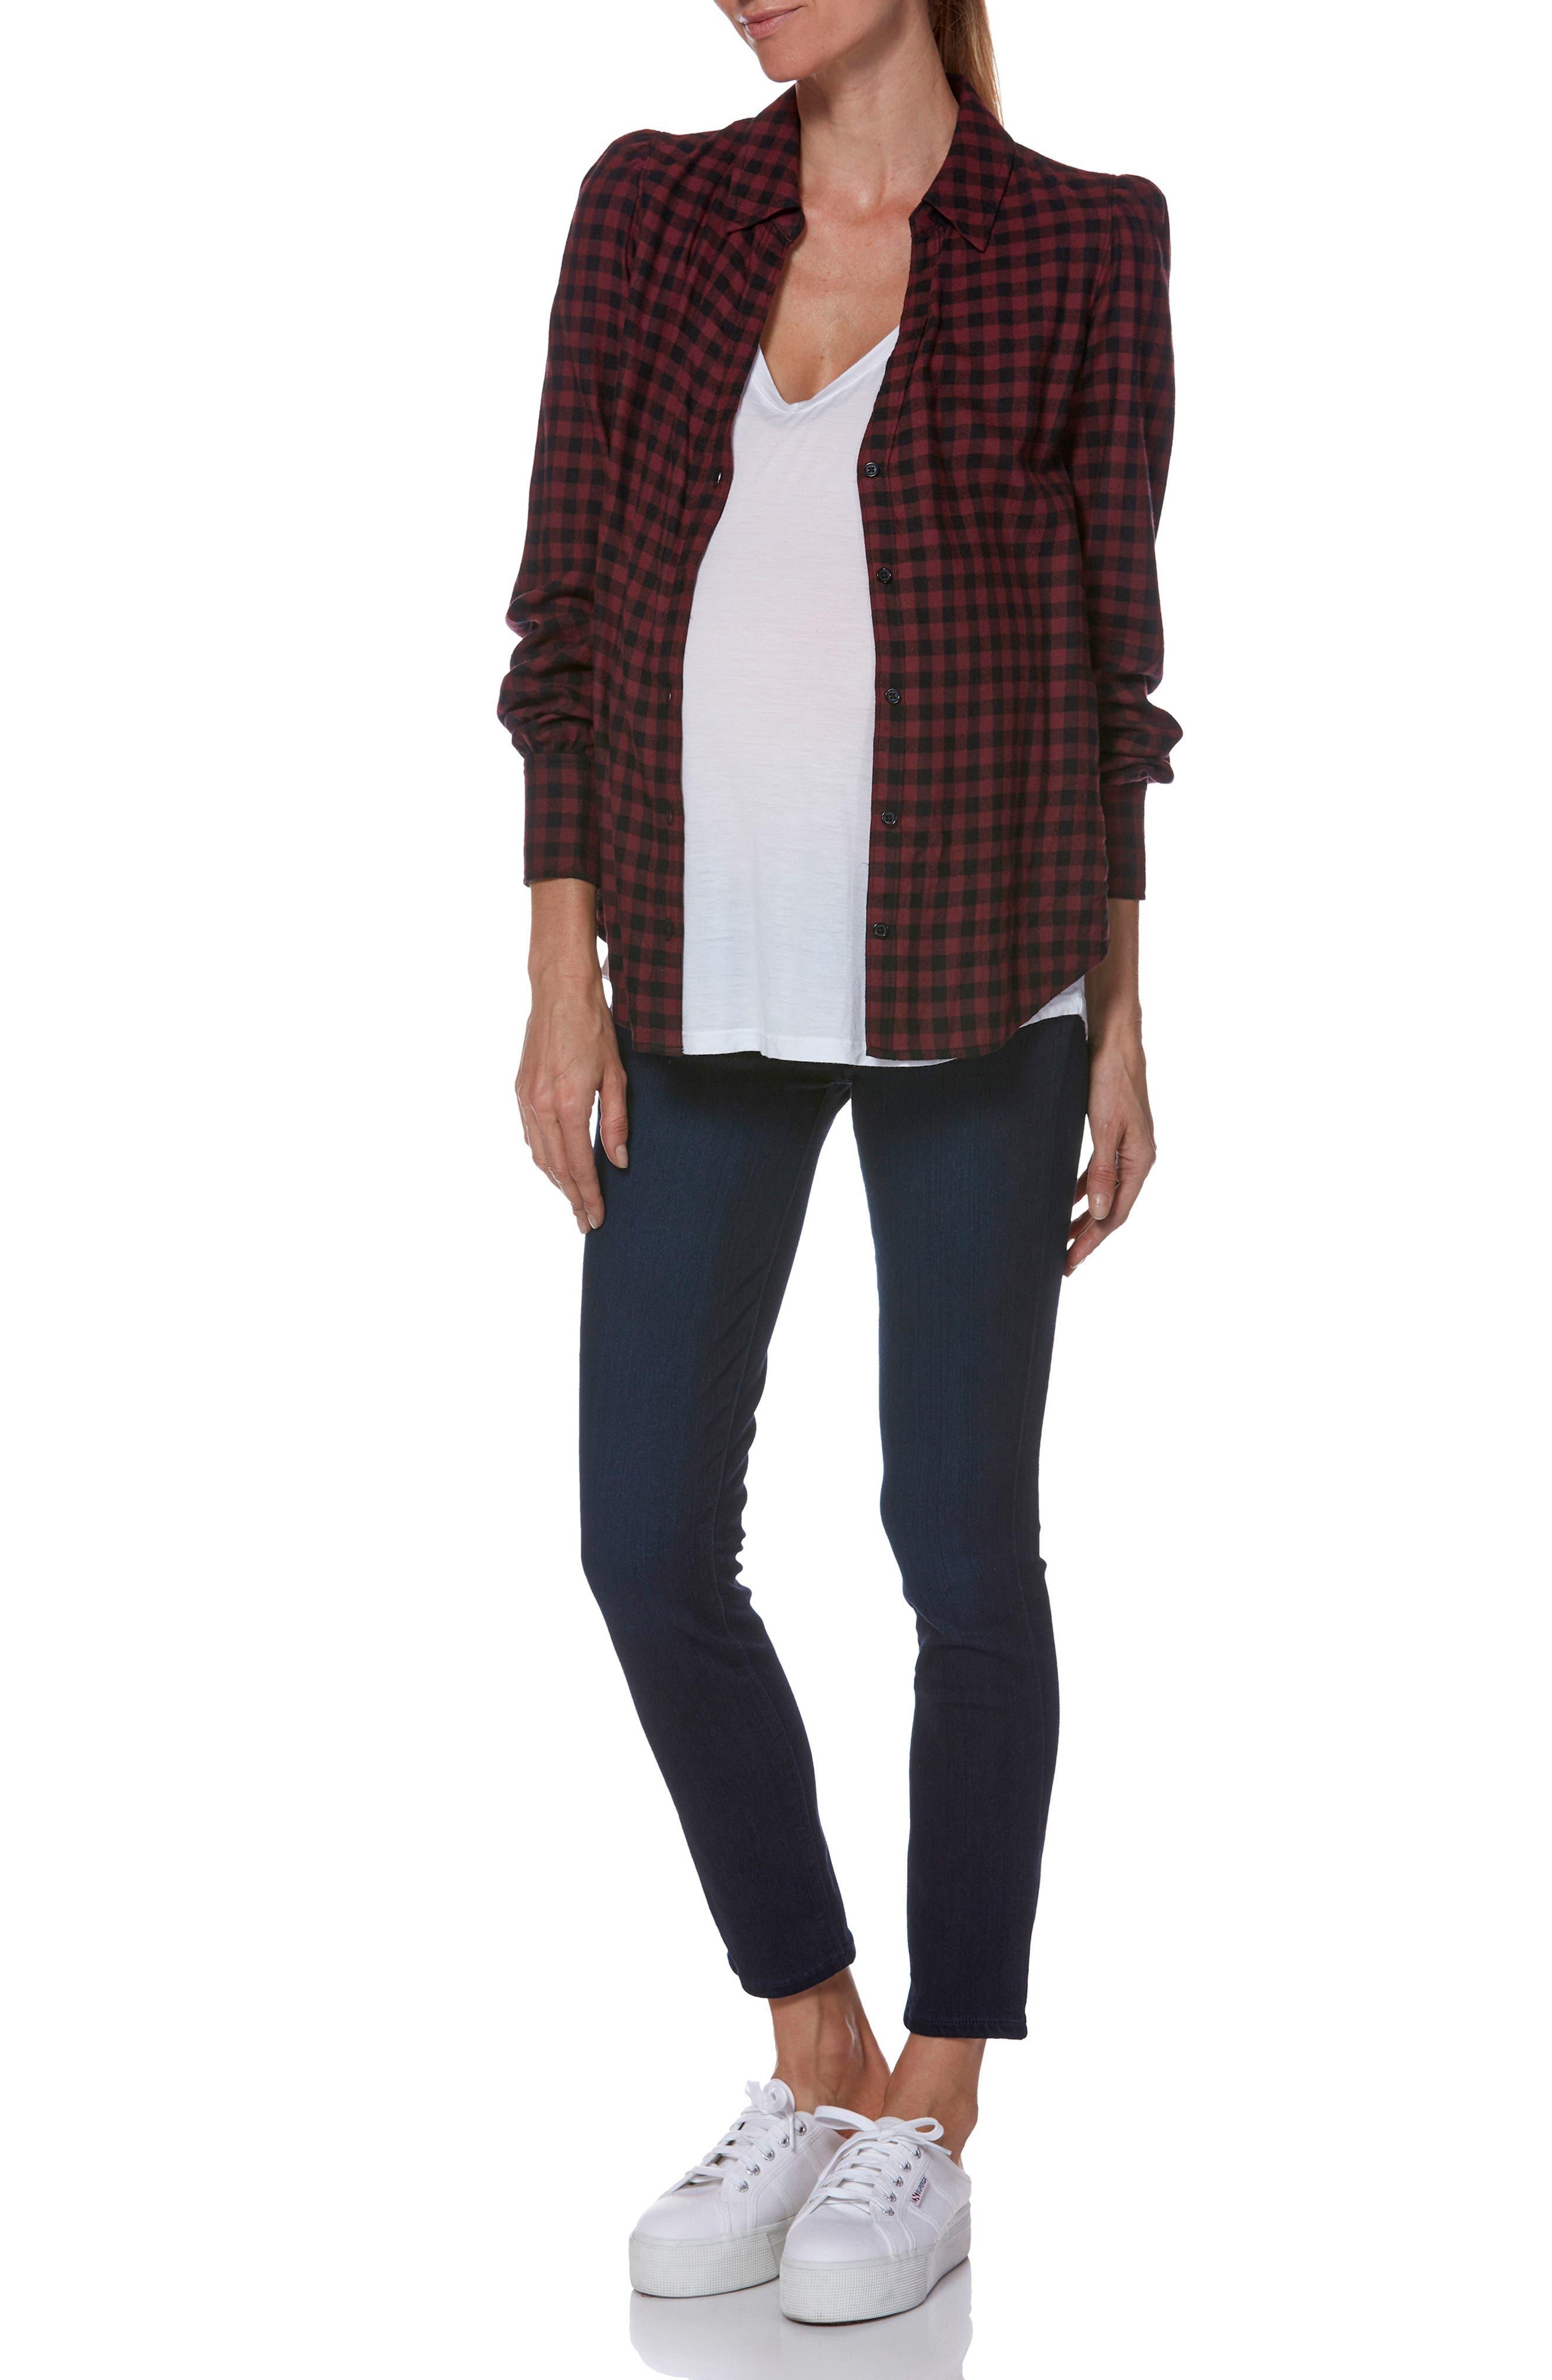 PAIGE,                             Transcend - Verdugo Ultra Skinny Maternity Jeans,                             Alternate thumbnail 5, color,                             LANA